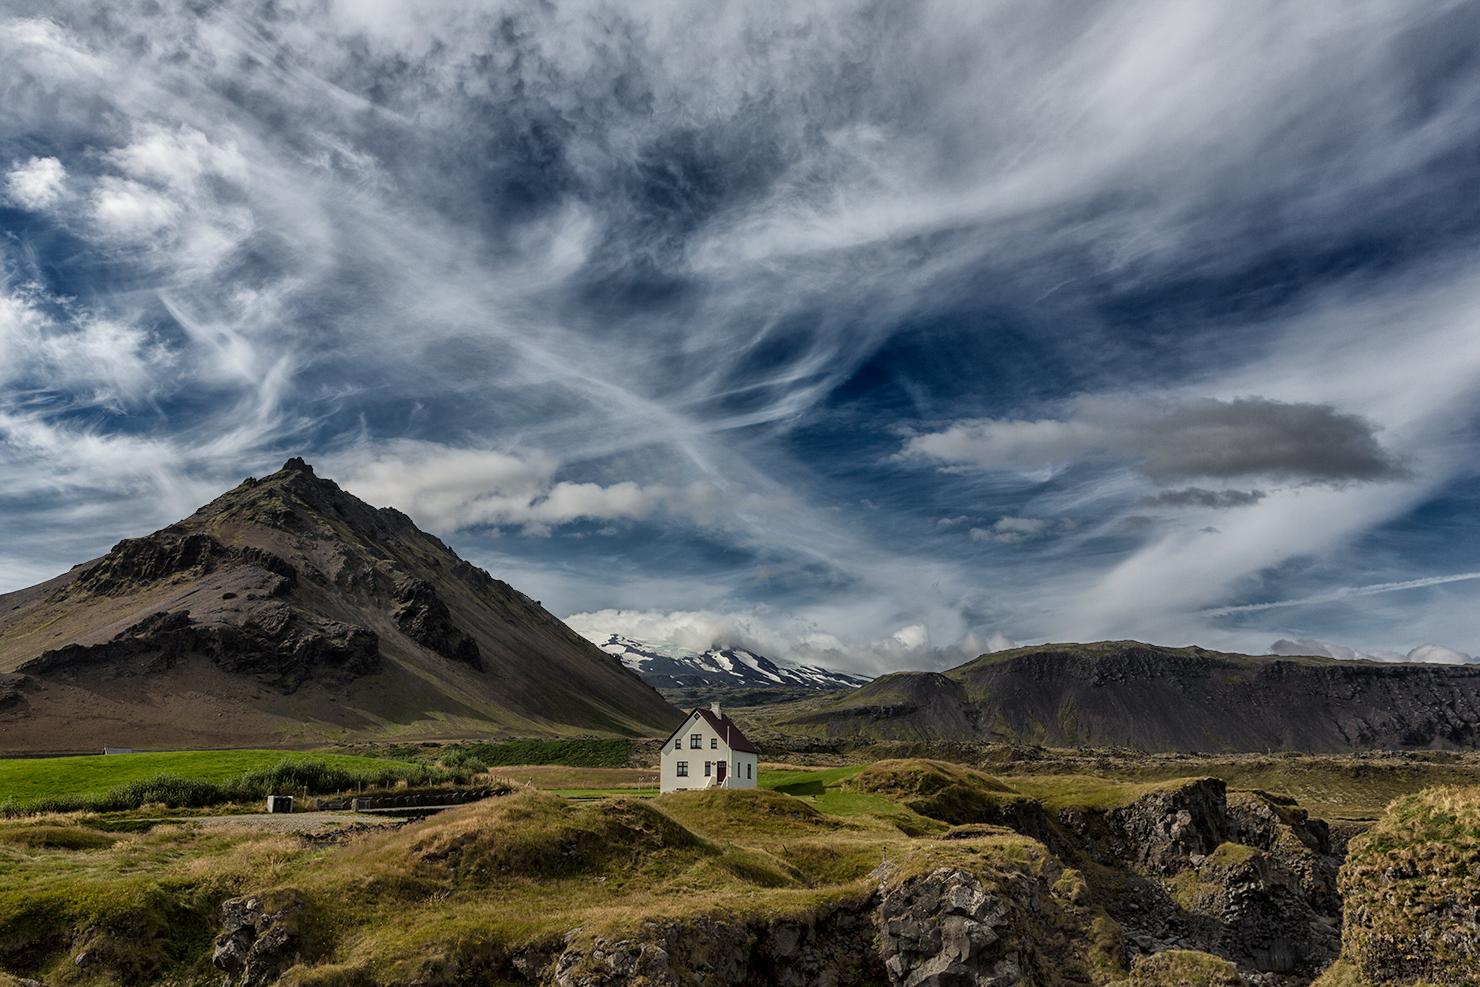 Paysages vers Arnarstapi sur la péninsule de Snaefellsnes